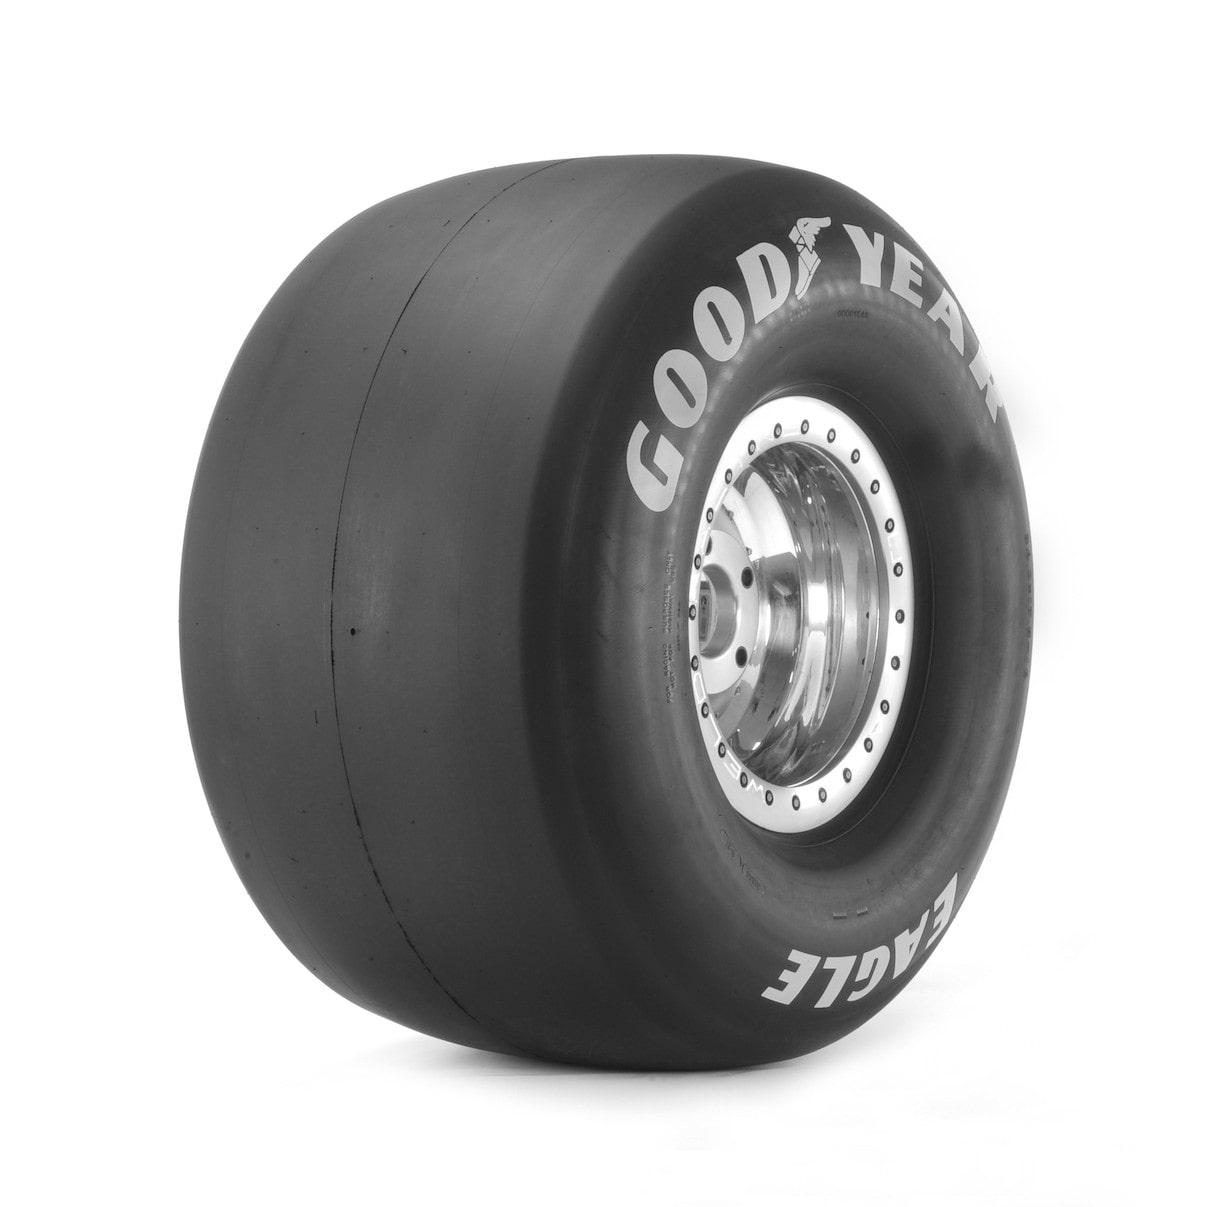 2003 - drag racing tire